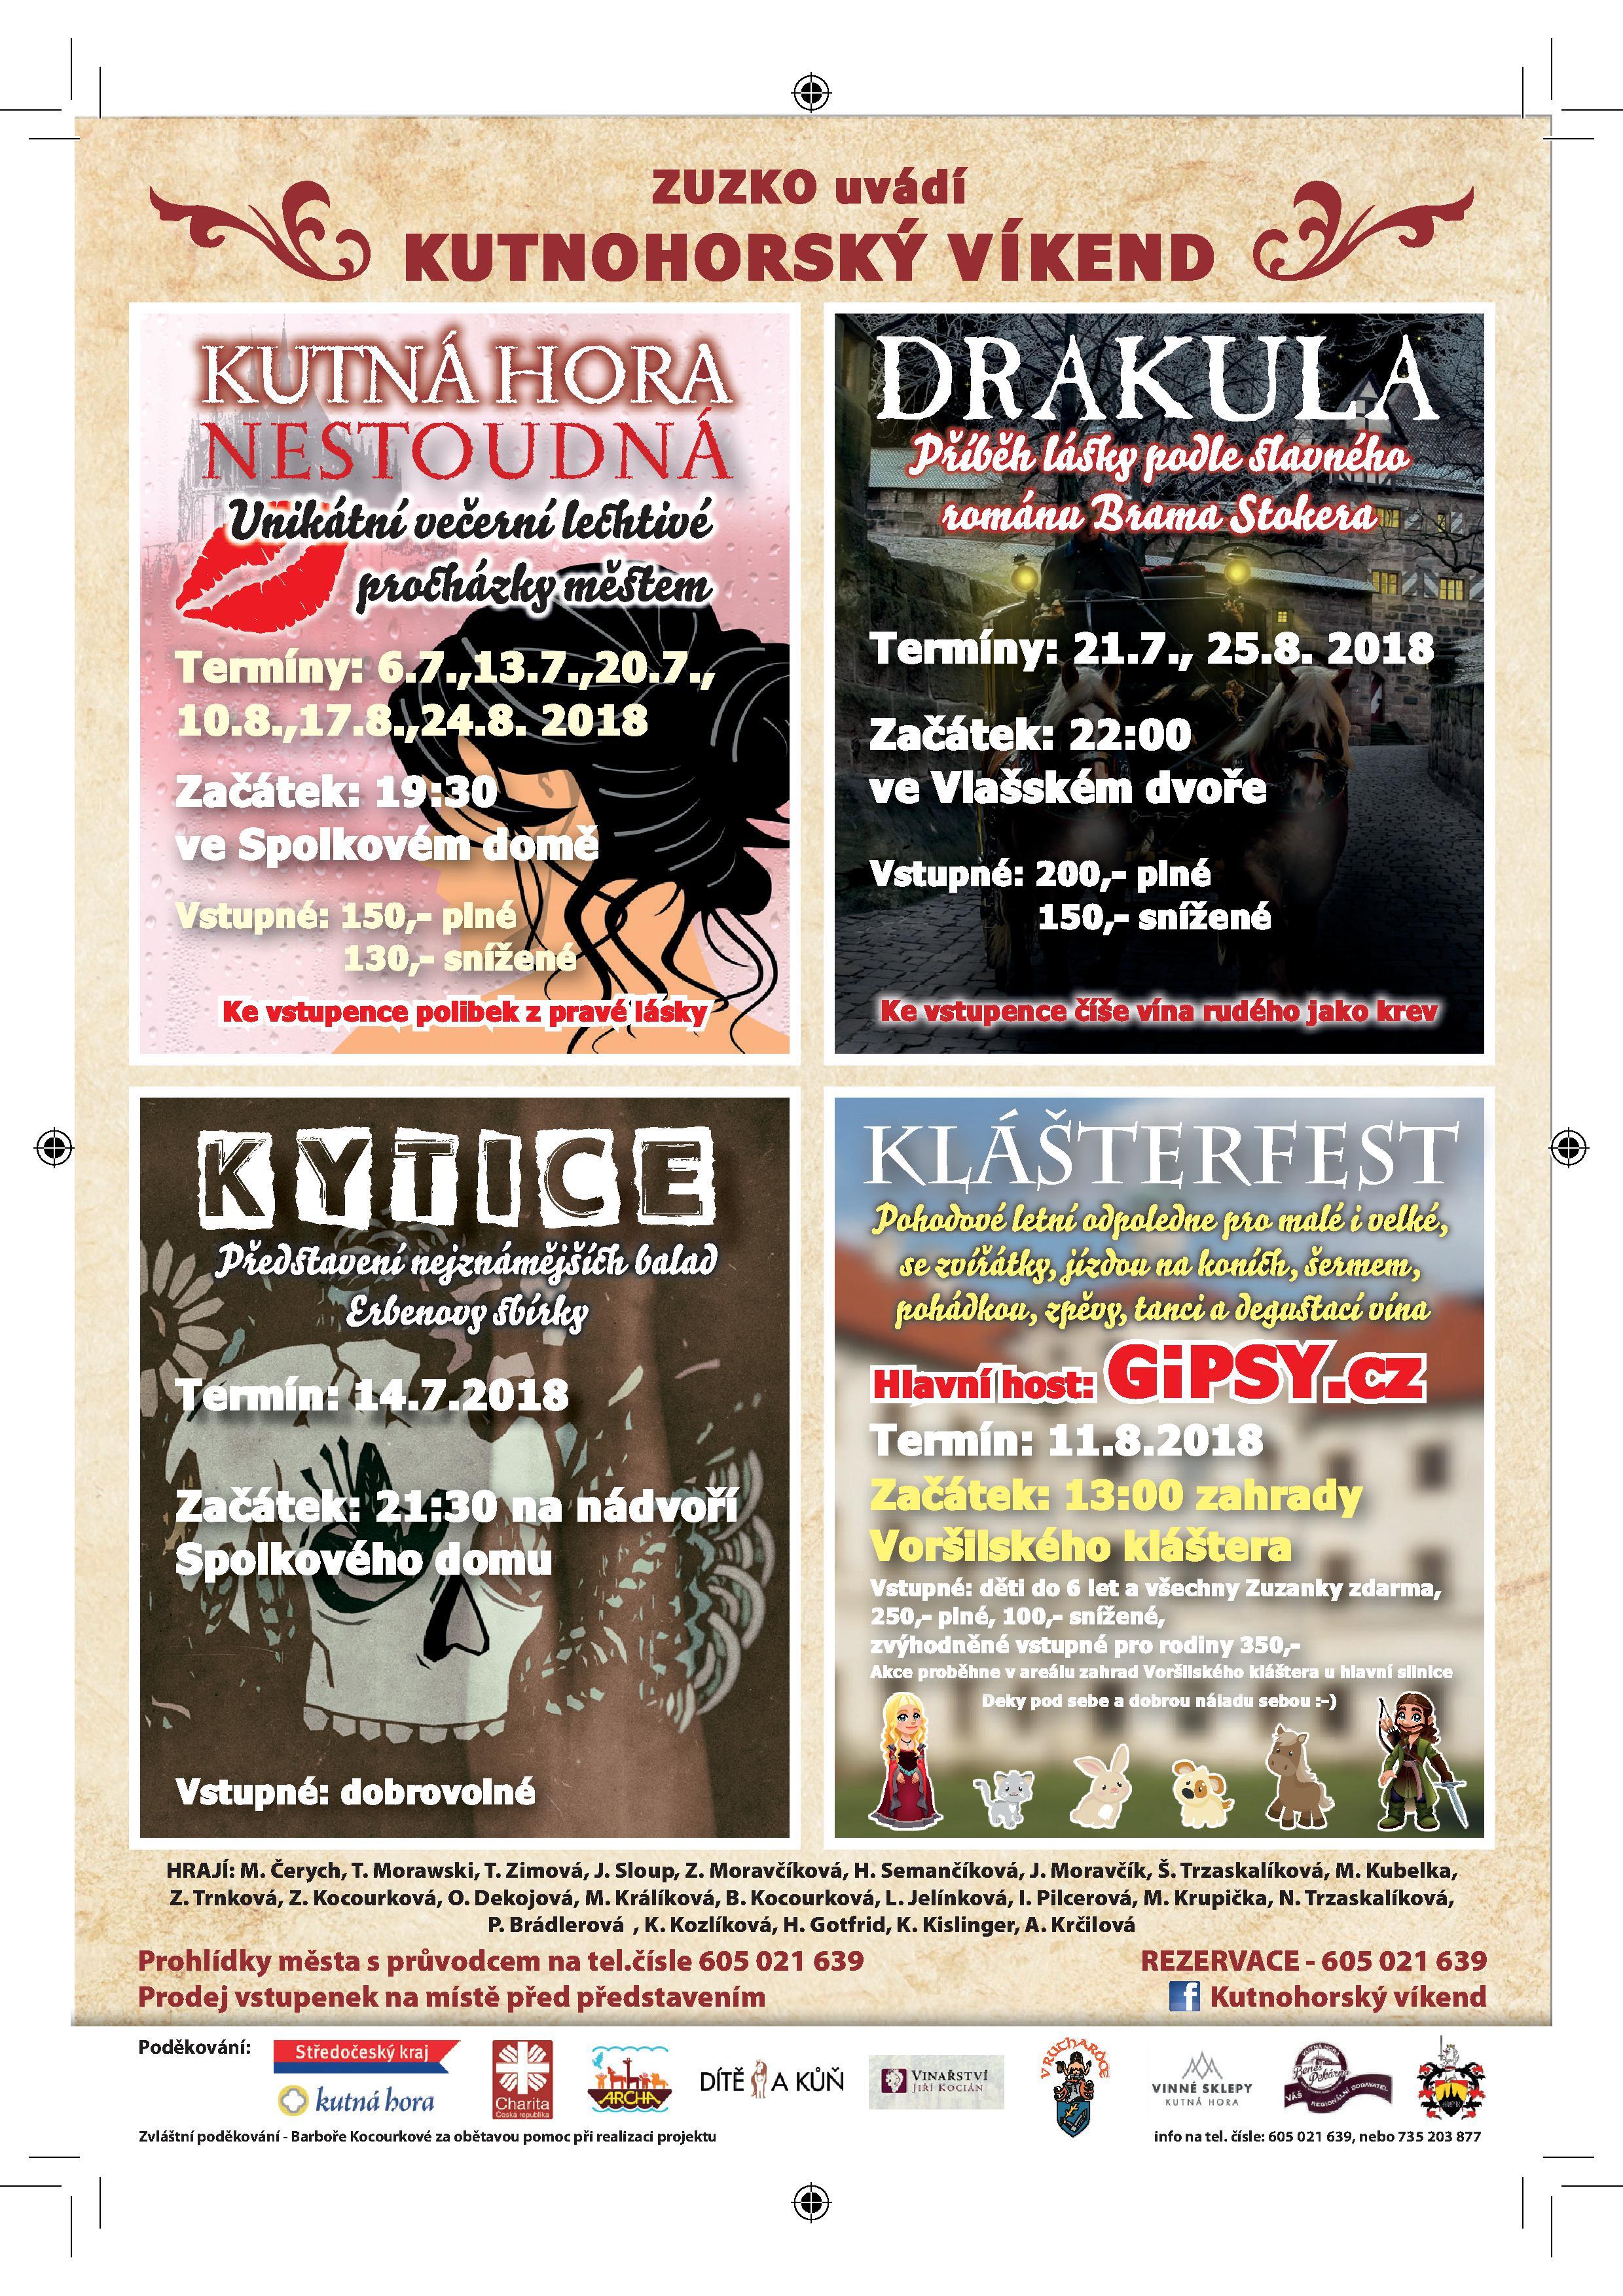 3691-plakat-kutnohorsky-vikend-a5-tisk.jpg